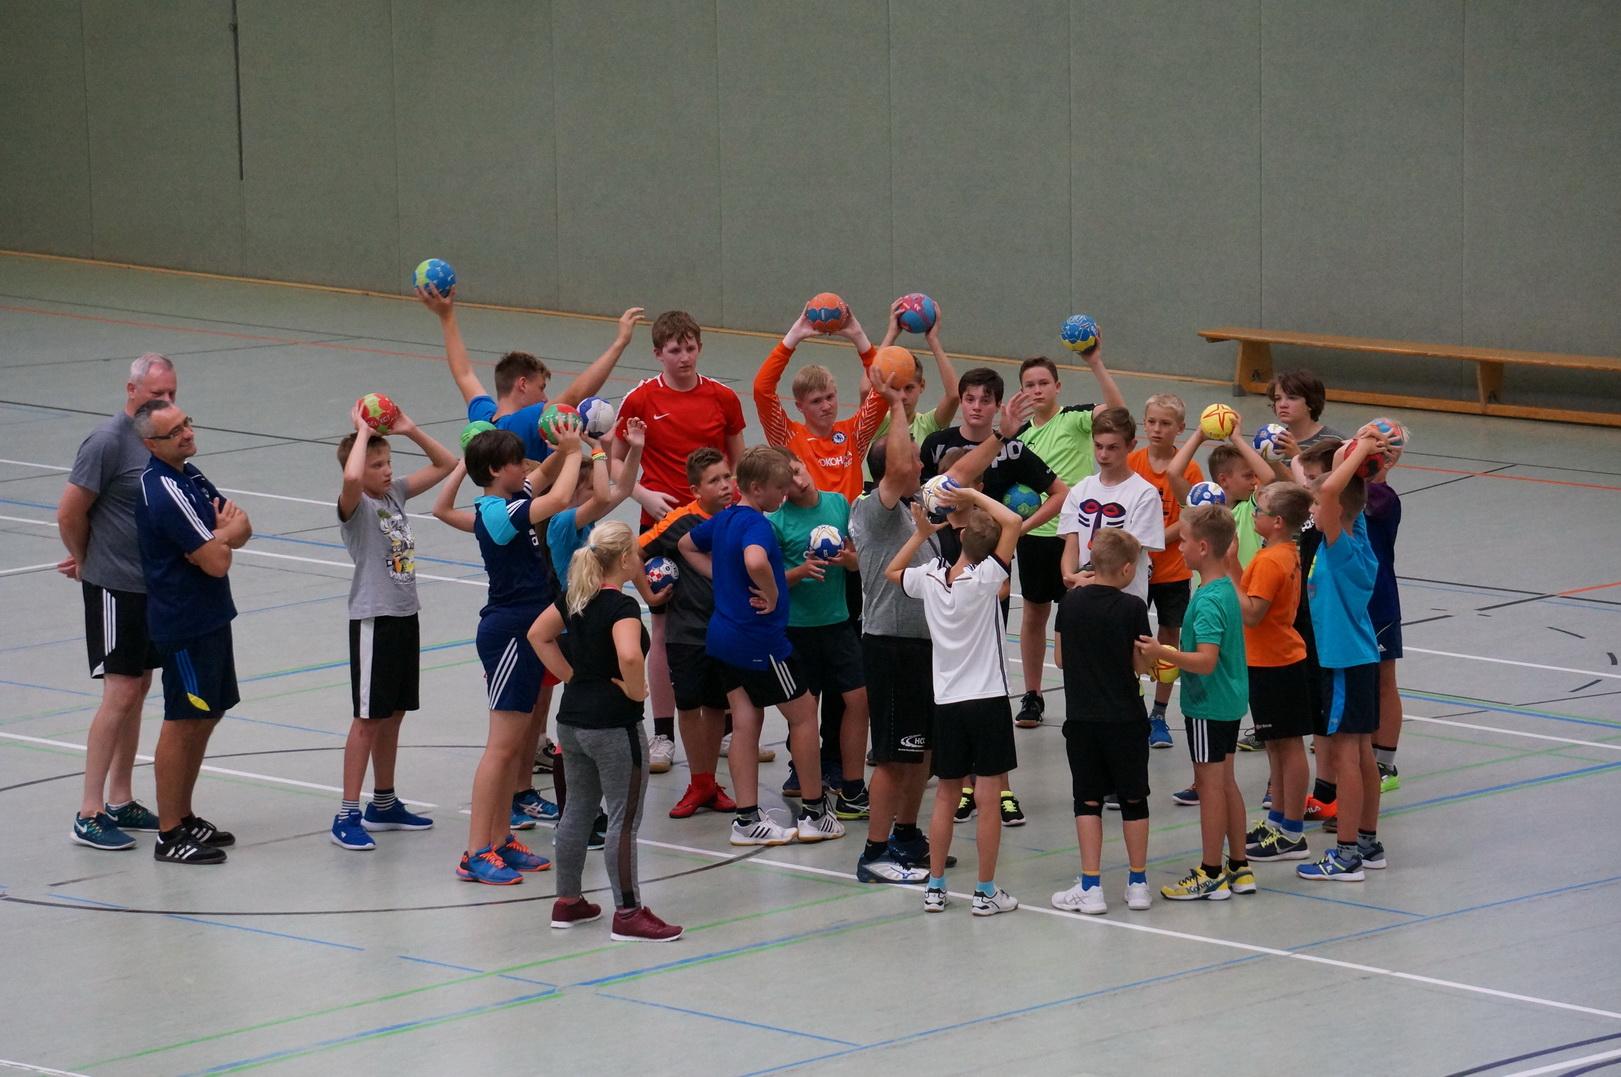 201808_Handballcamp_SDH_MG_087w